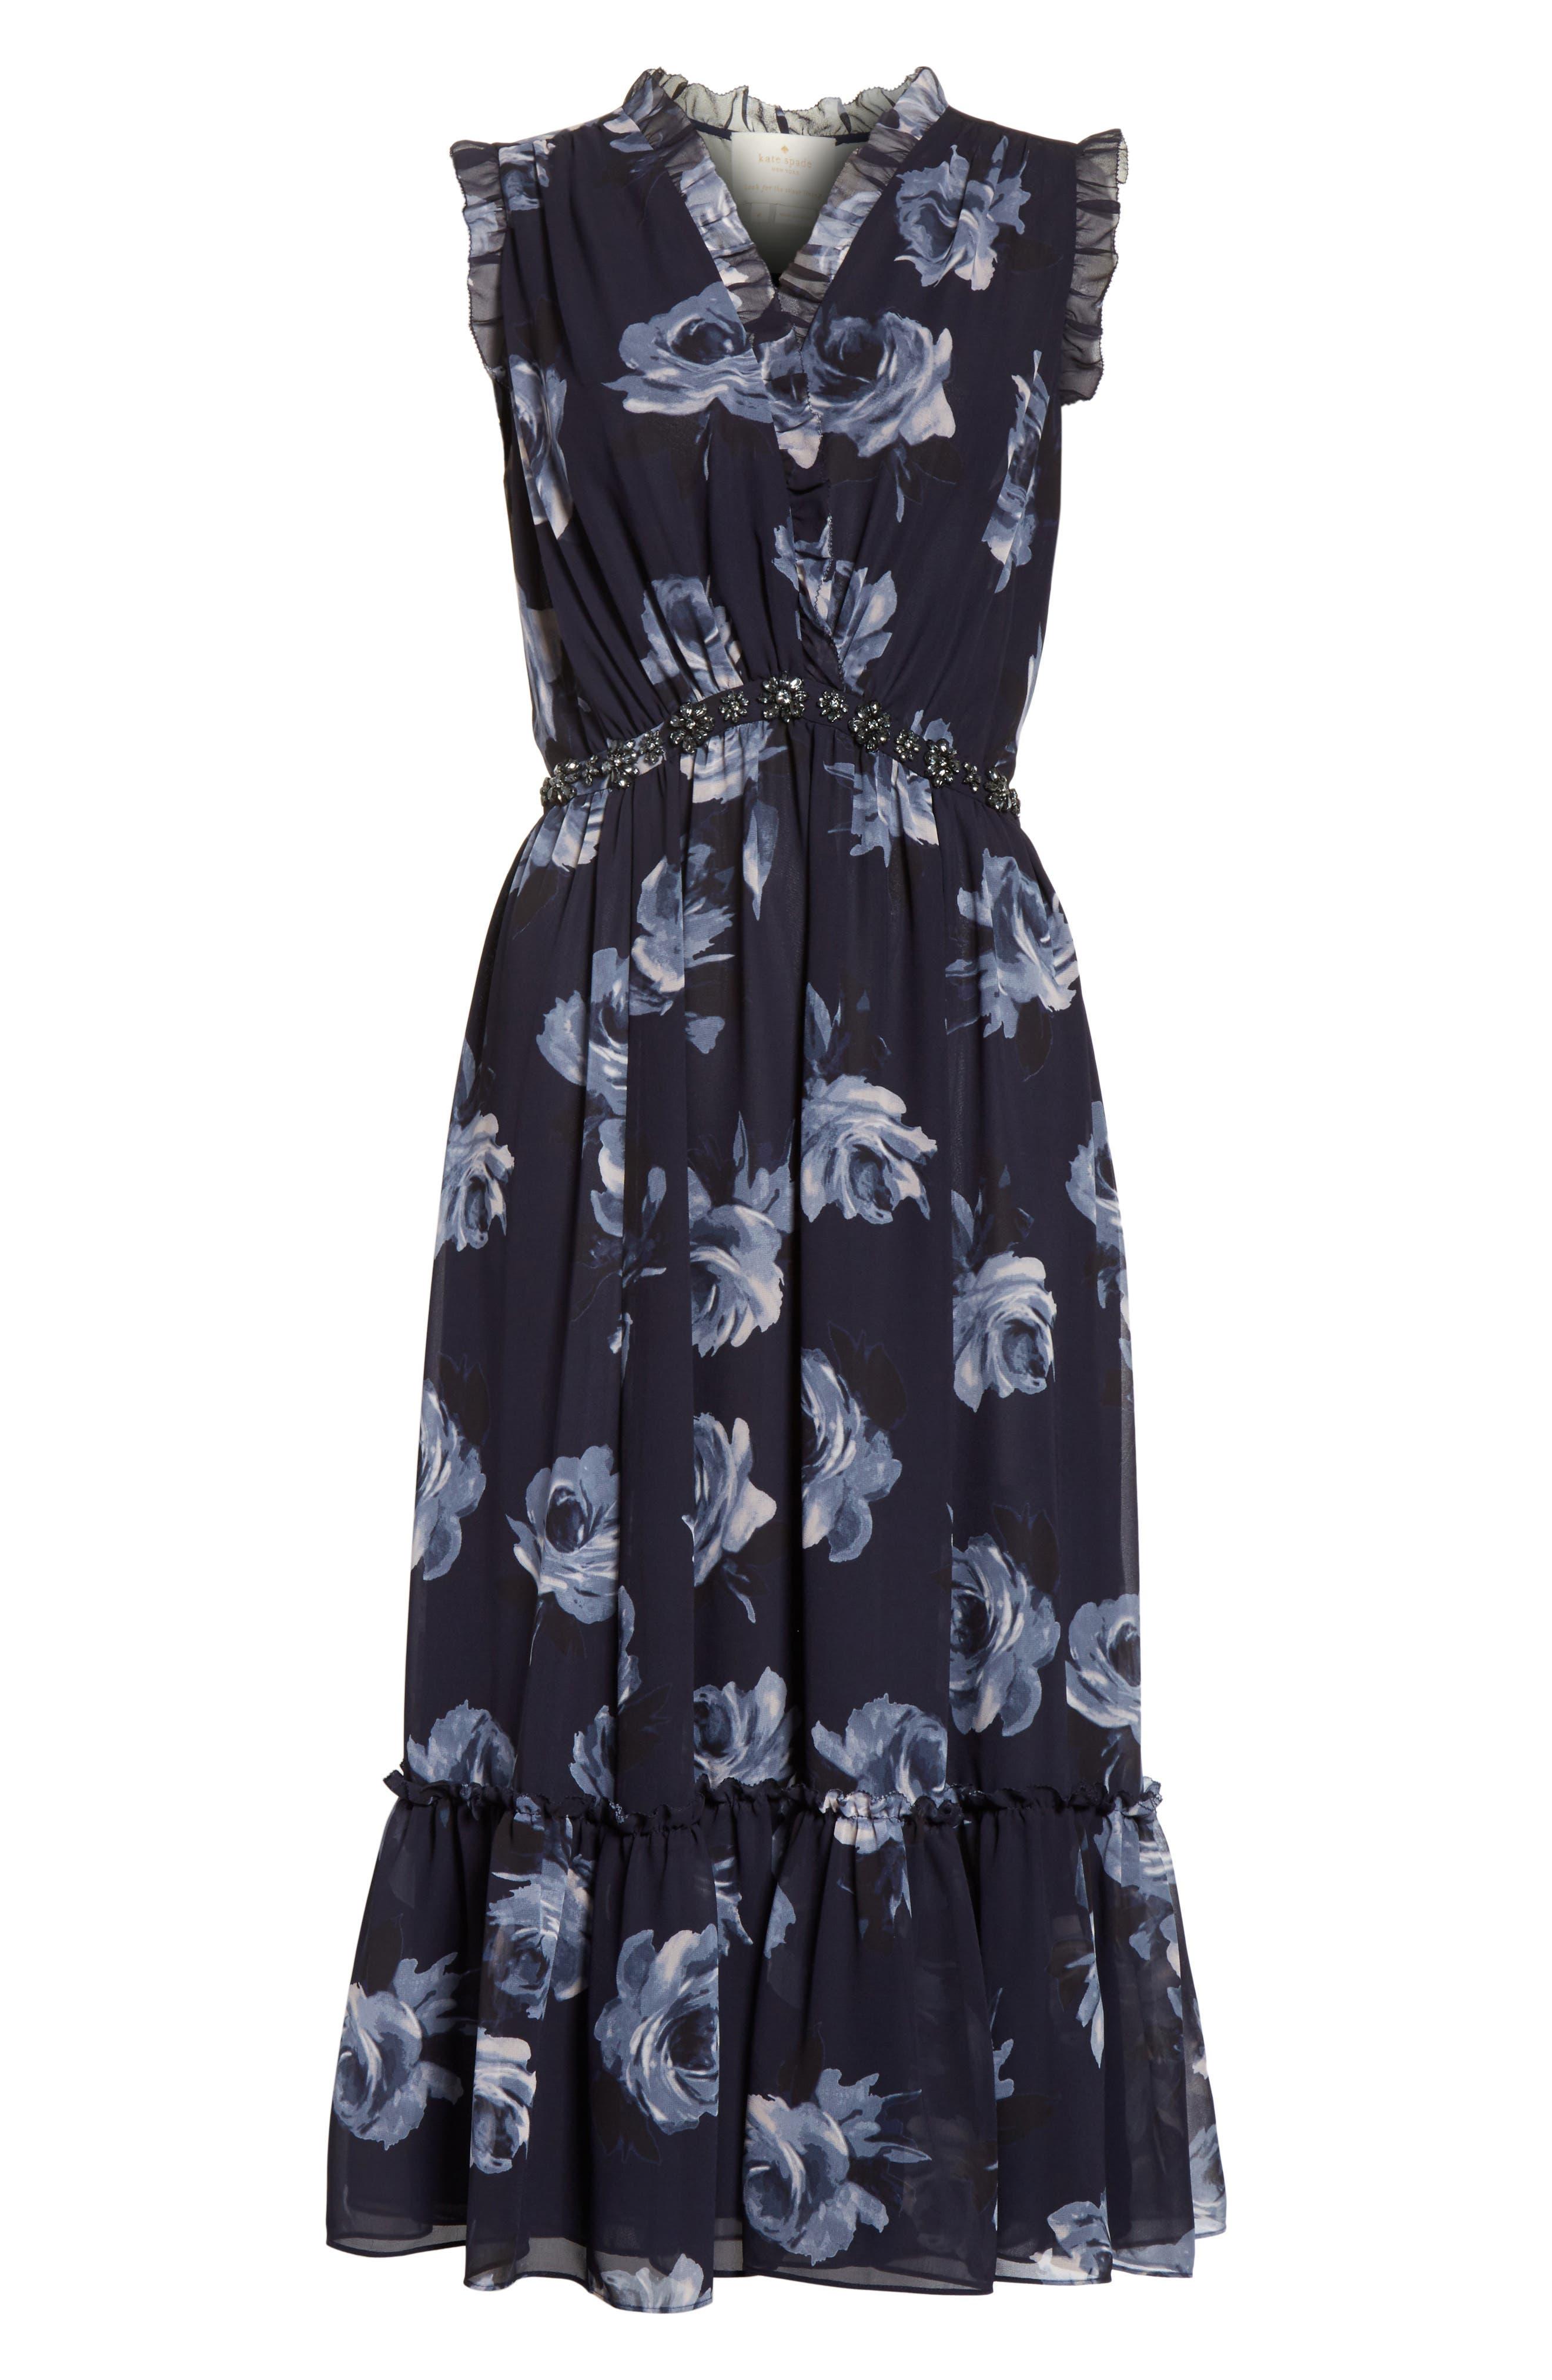 kade spade new york Night Rose Chiffon Midi Dress,                             Alternate thumbnail 6, color,                             473